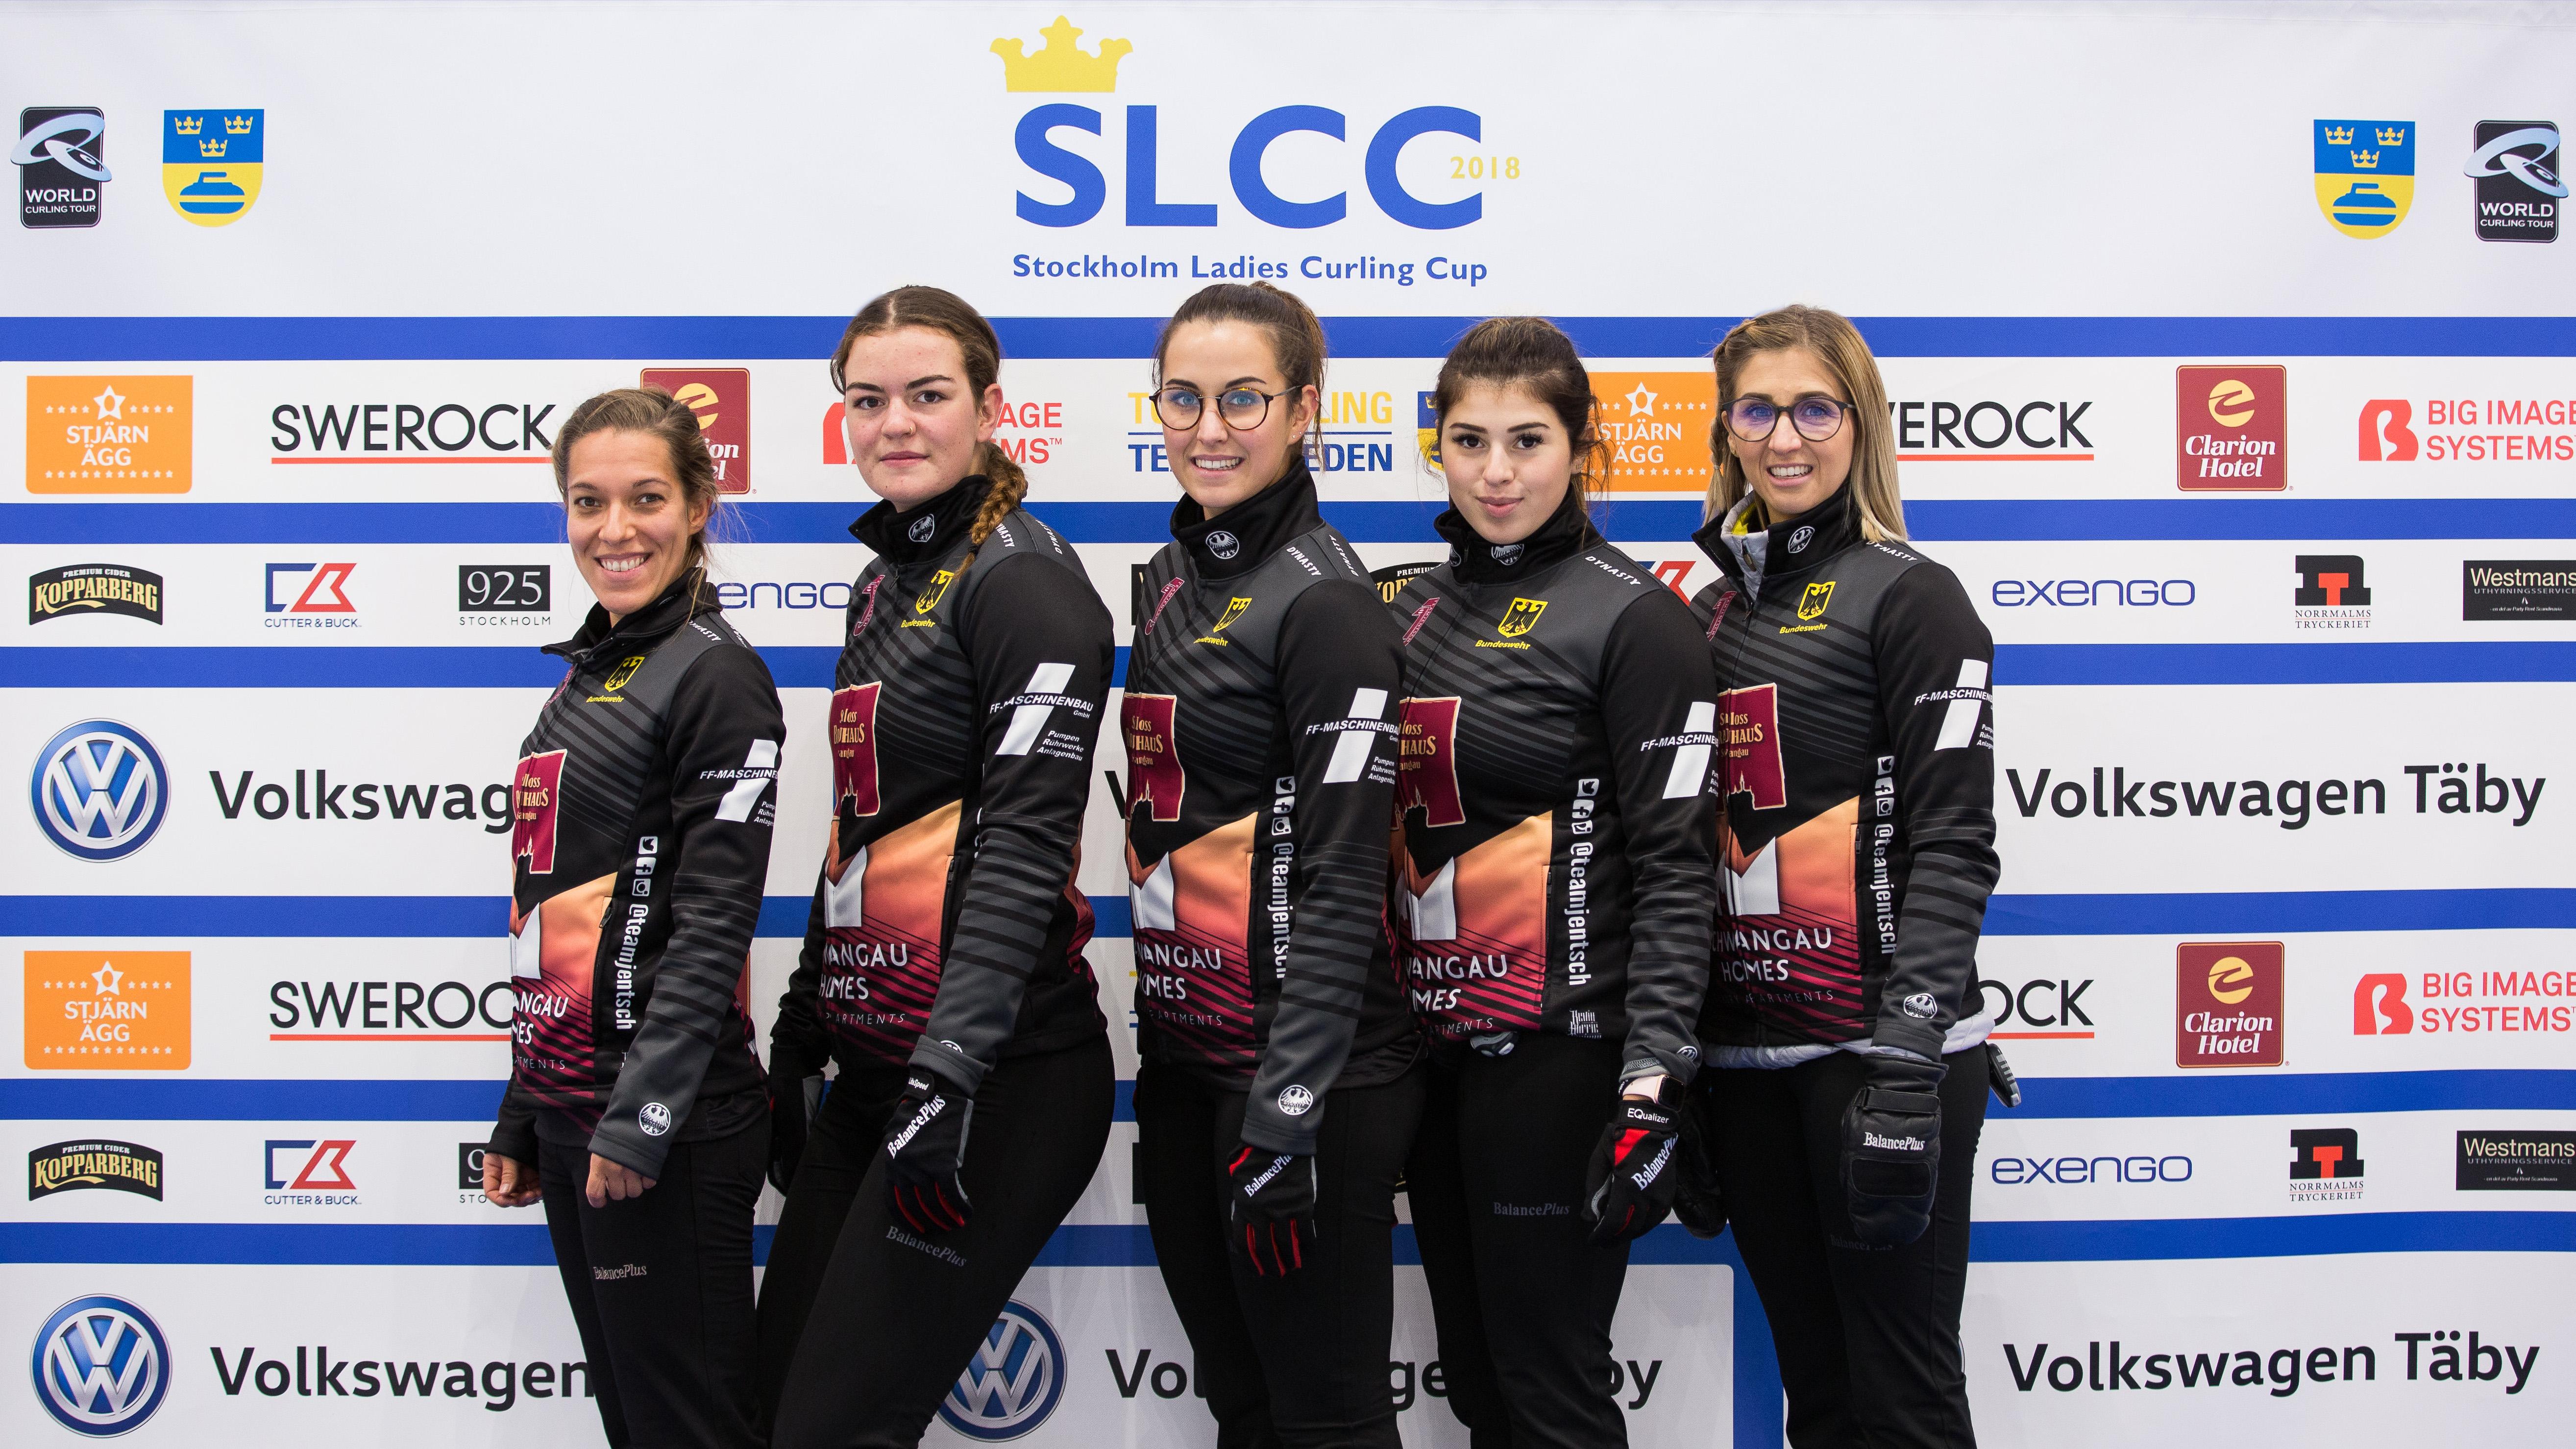 Team Jentsch